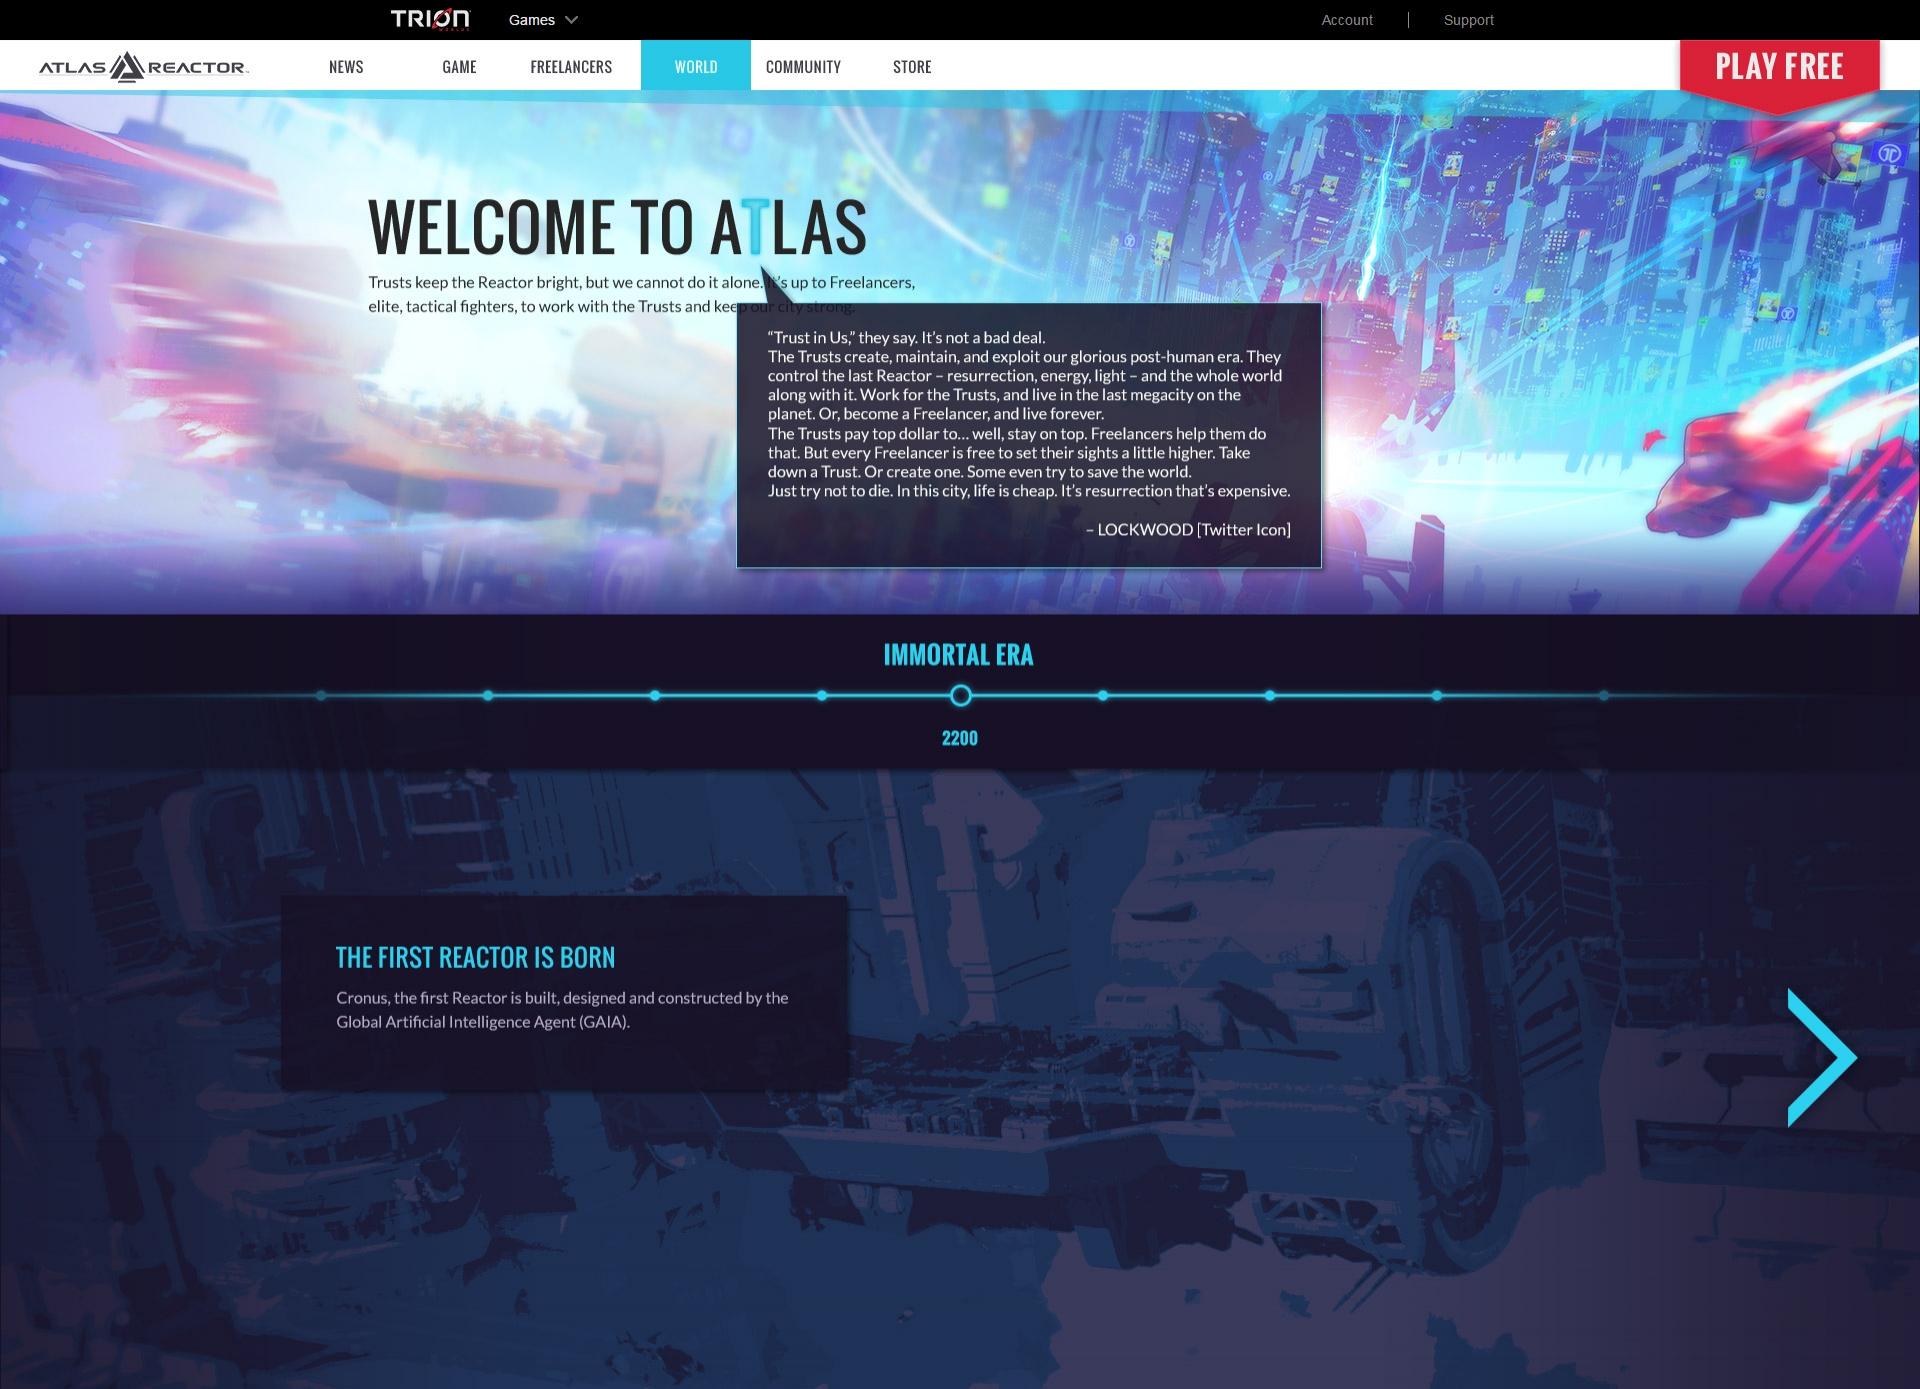 Atlas Reactor - World (detail)